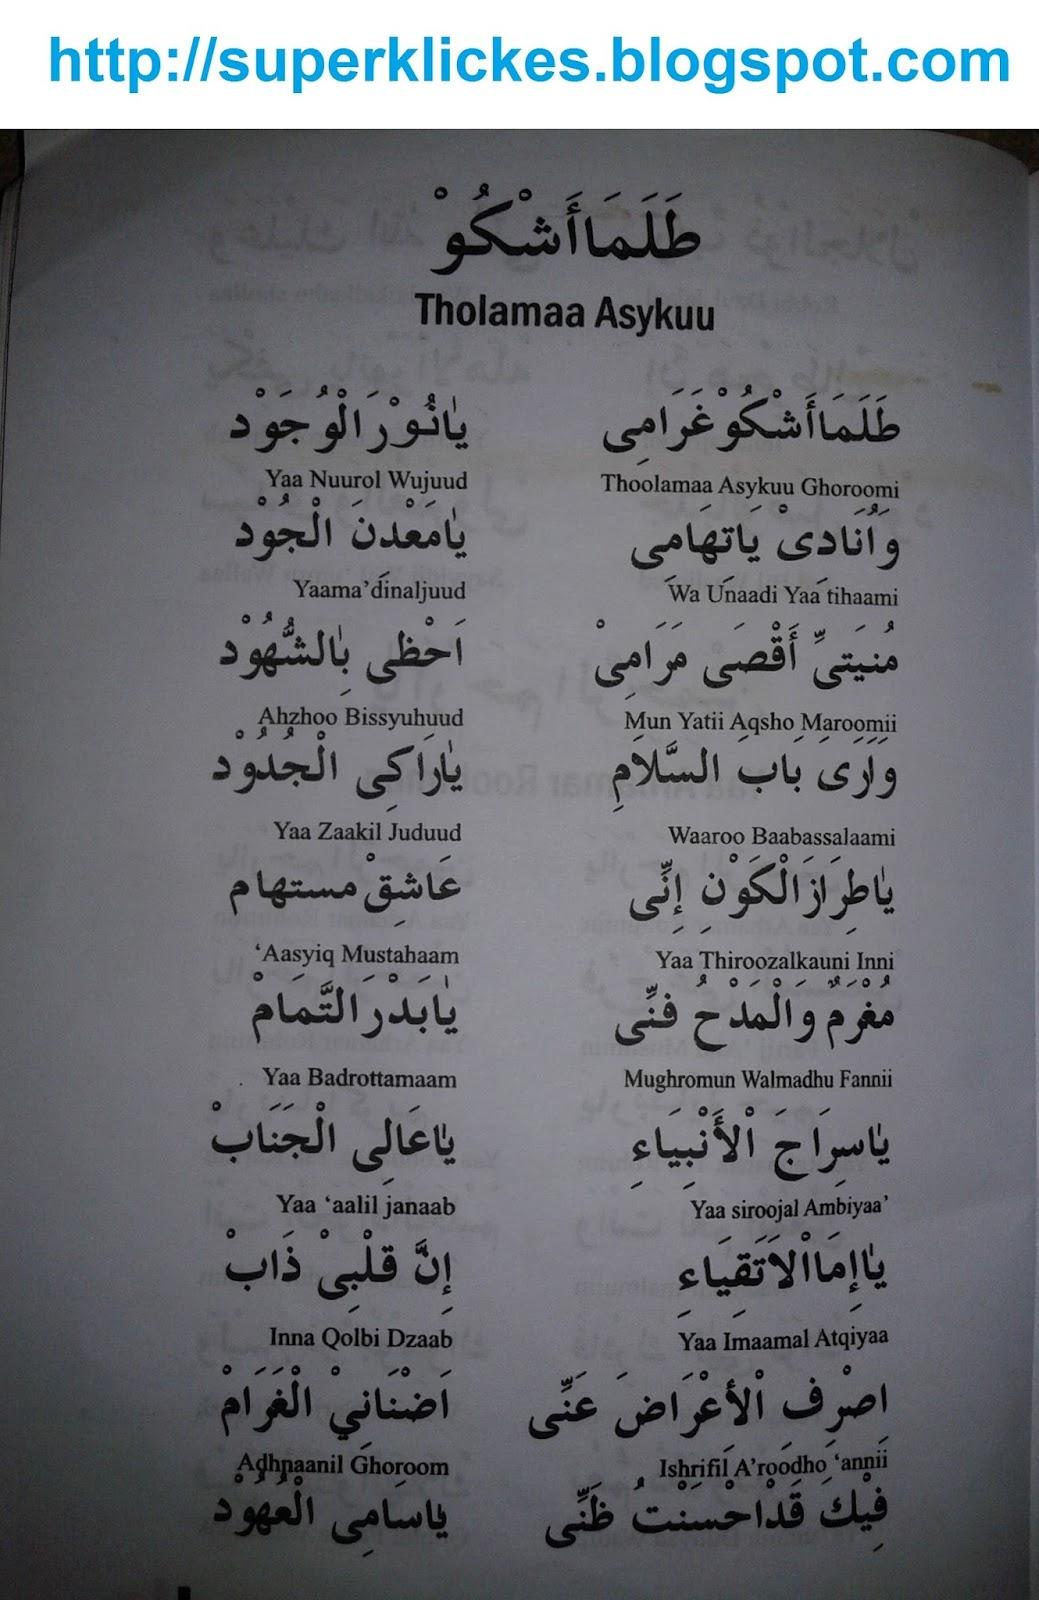 Lirik Lagu Sholawat Tholama Asyku Ghoromi Versi Habib Syech Bin